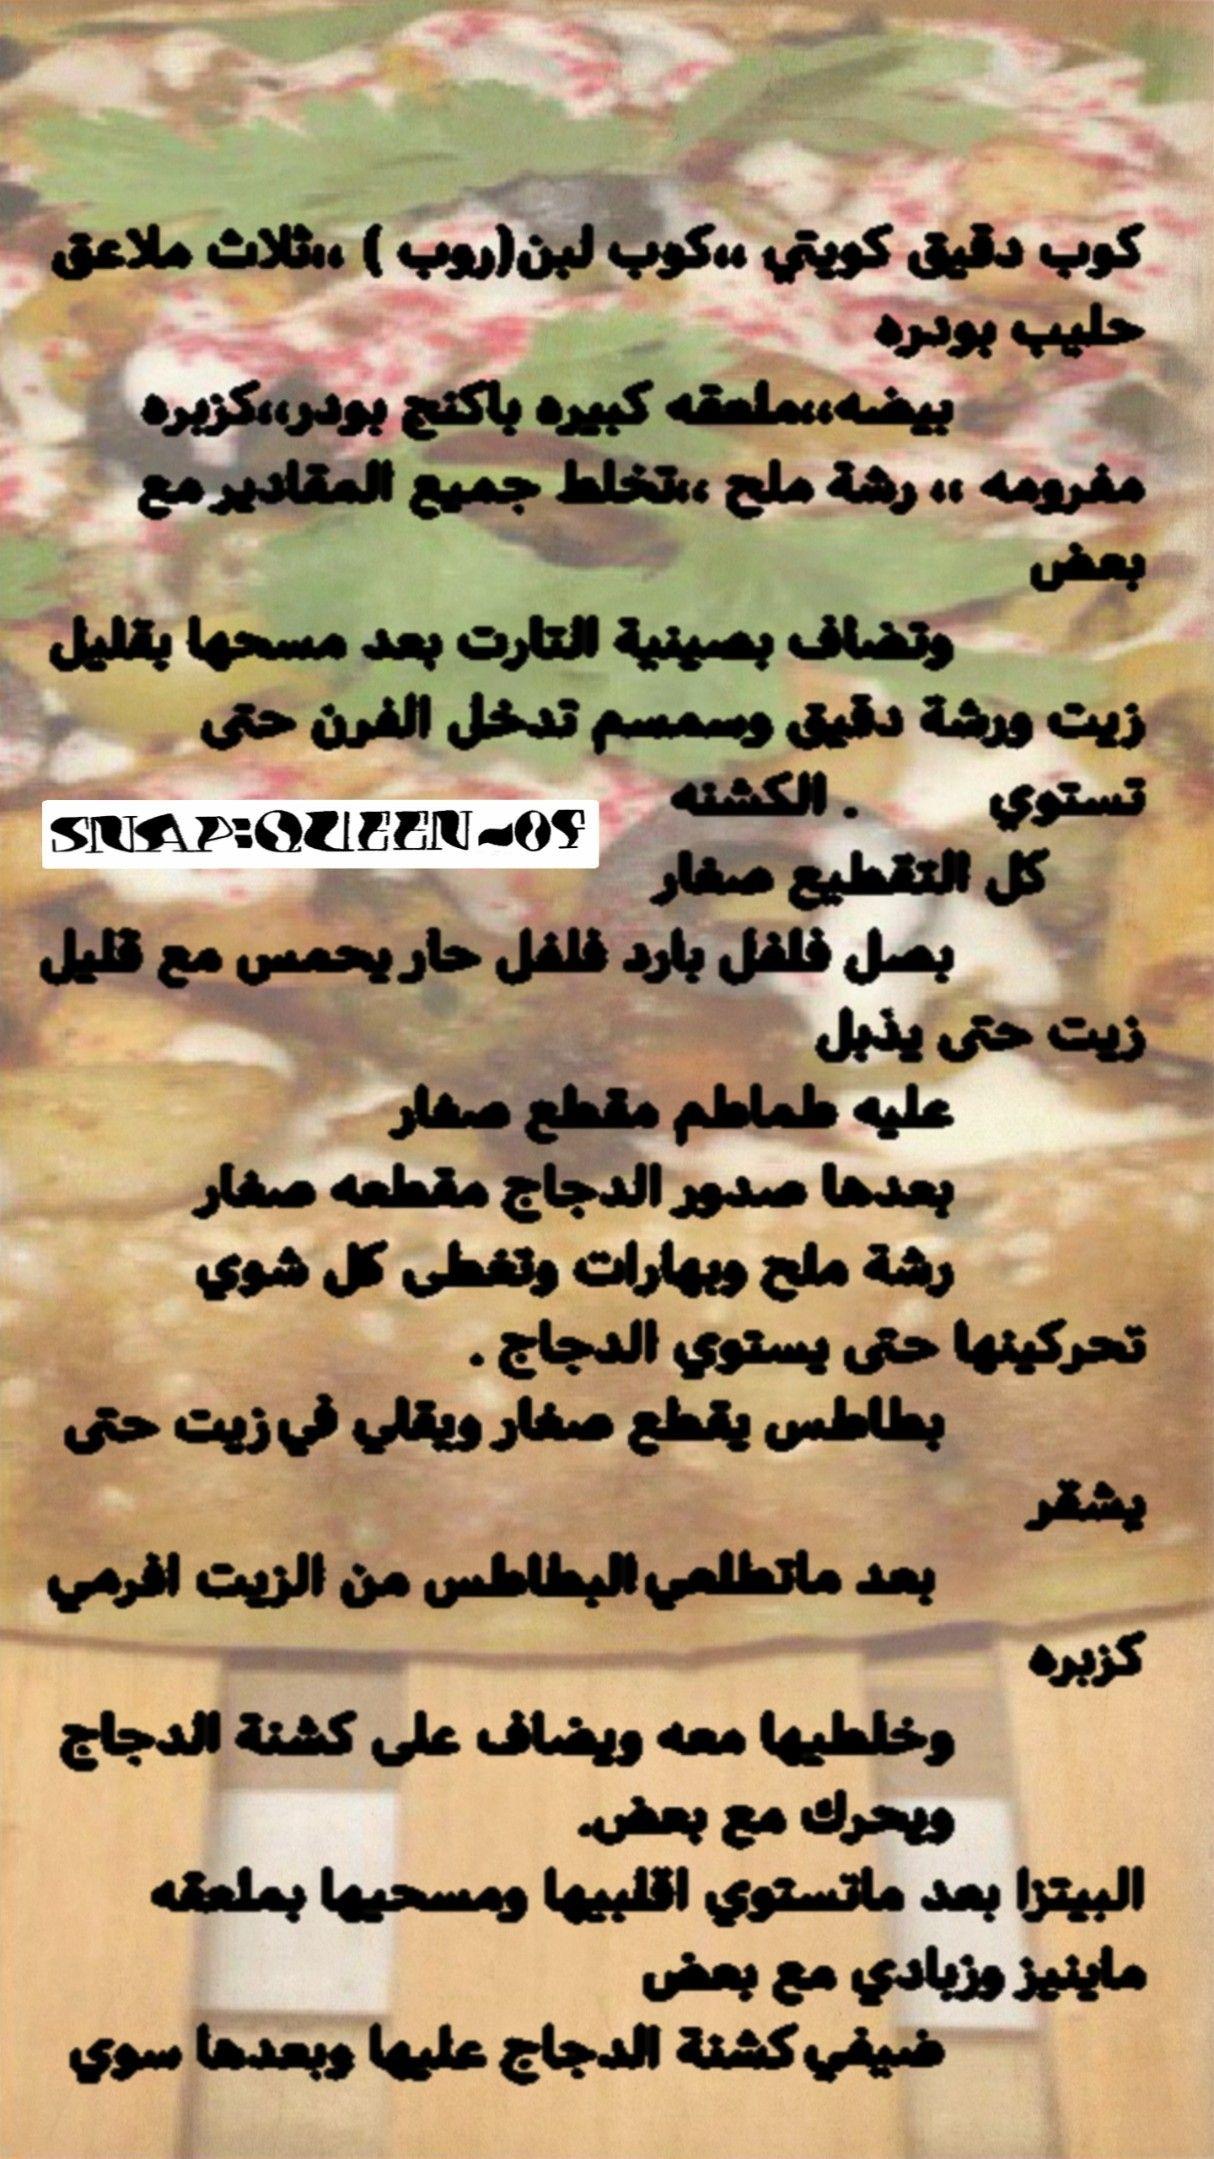 Pin By سيده الذوق On طبخات Calligraphy Arabic Calligraphy